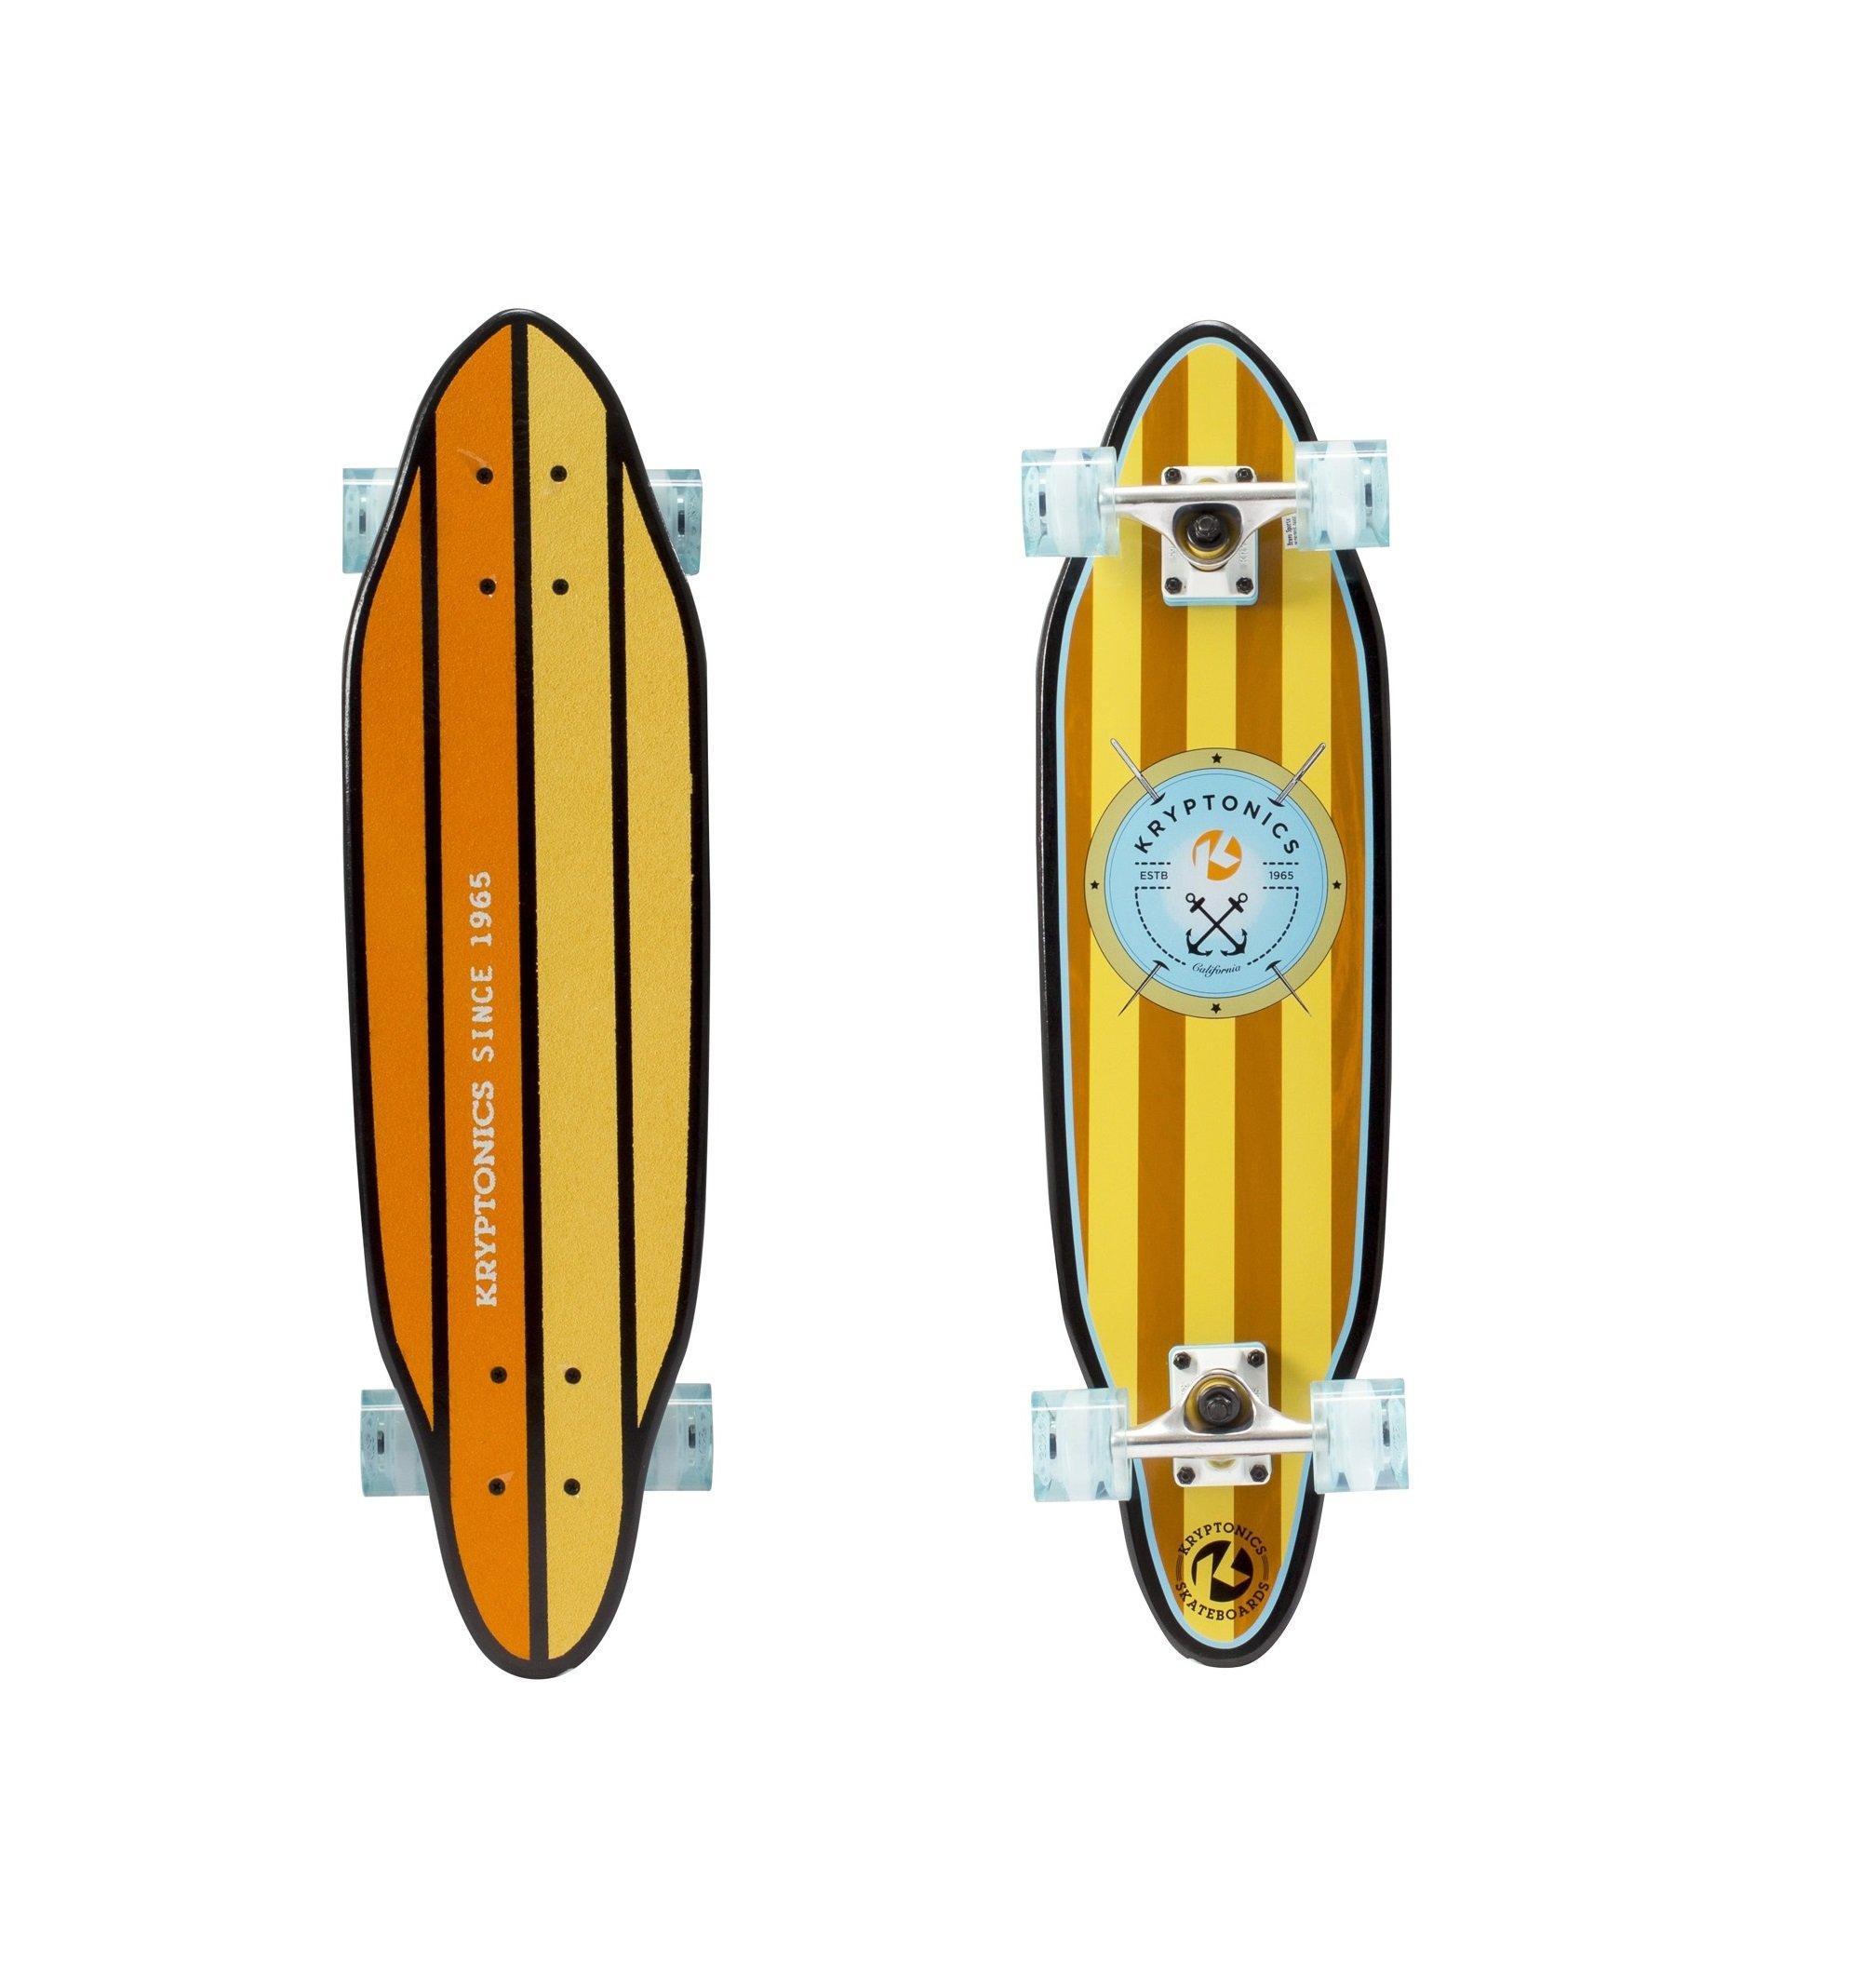 Kryptonics 30'' Cutaway Cruiser Skateboard, Anchors